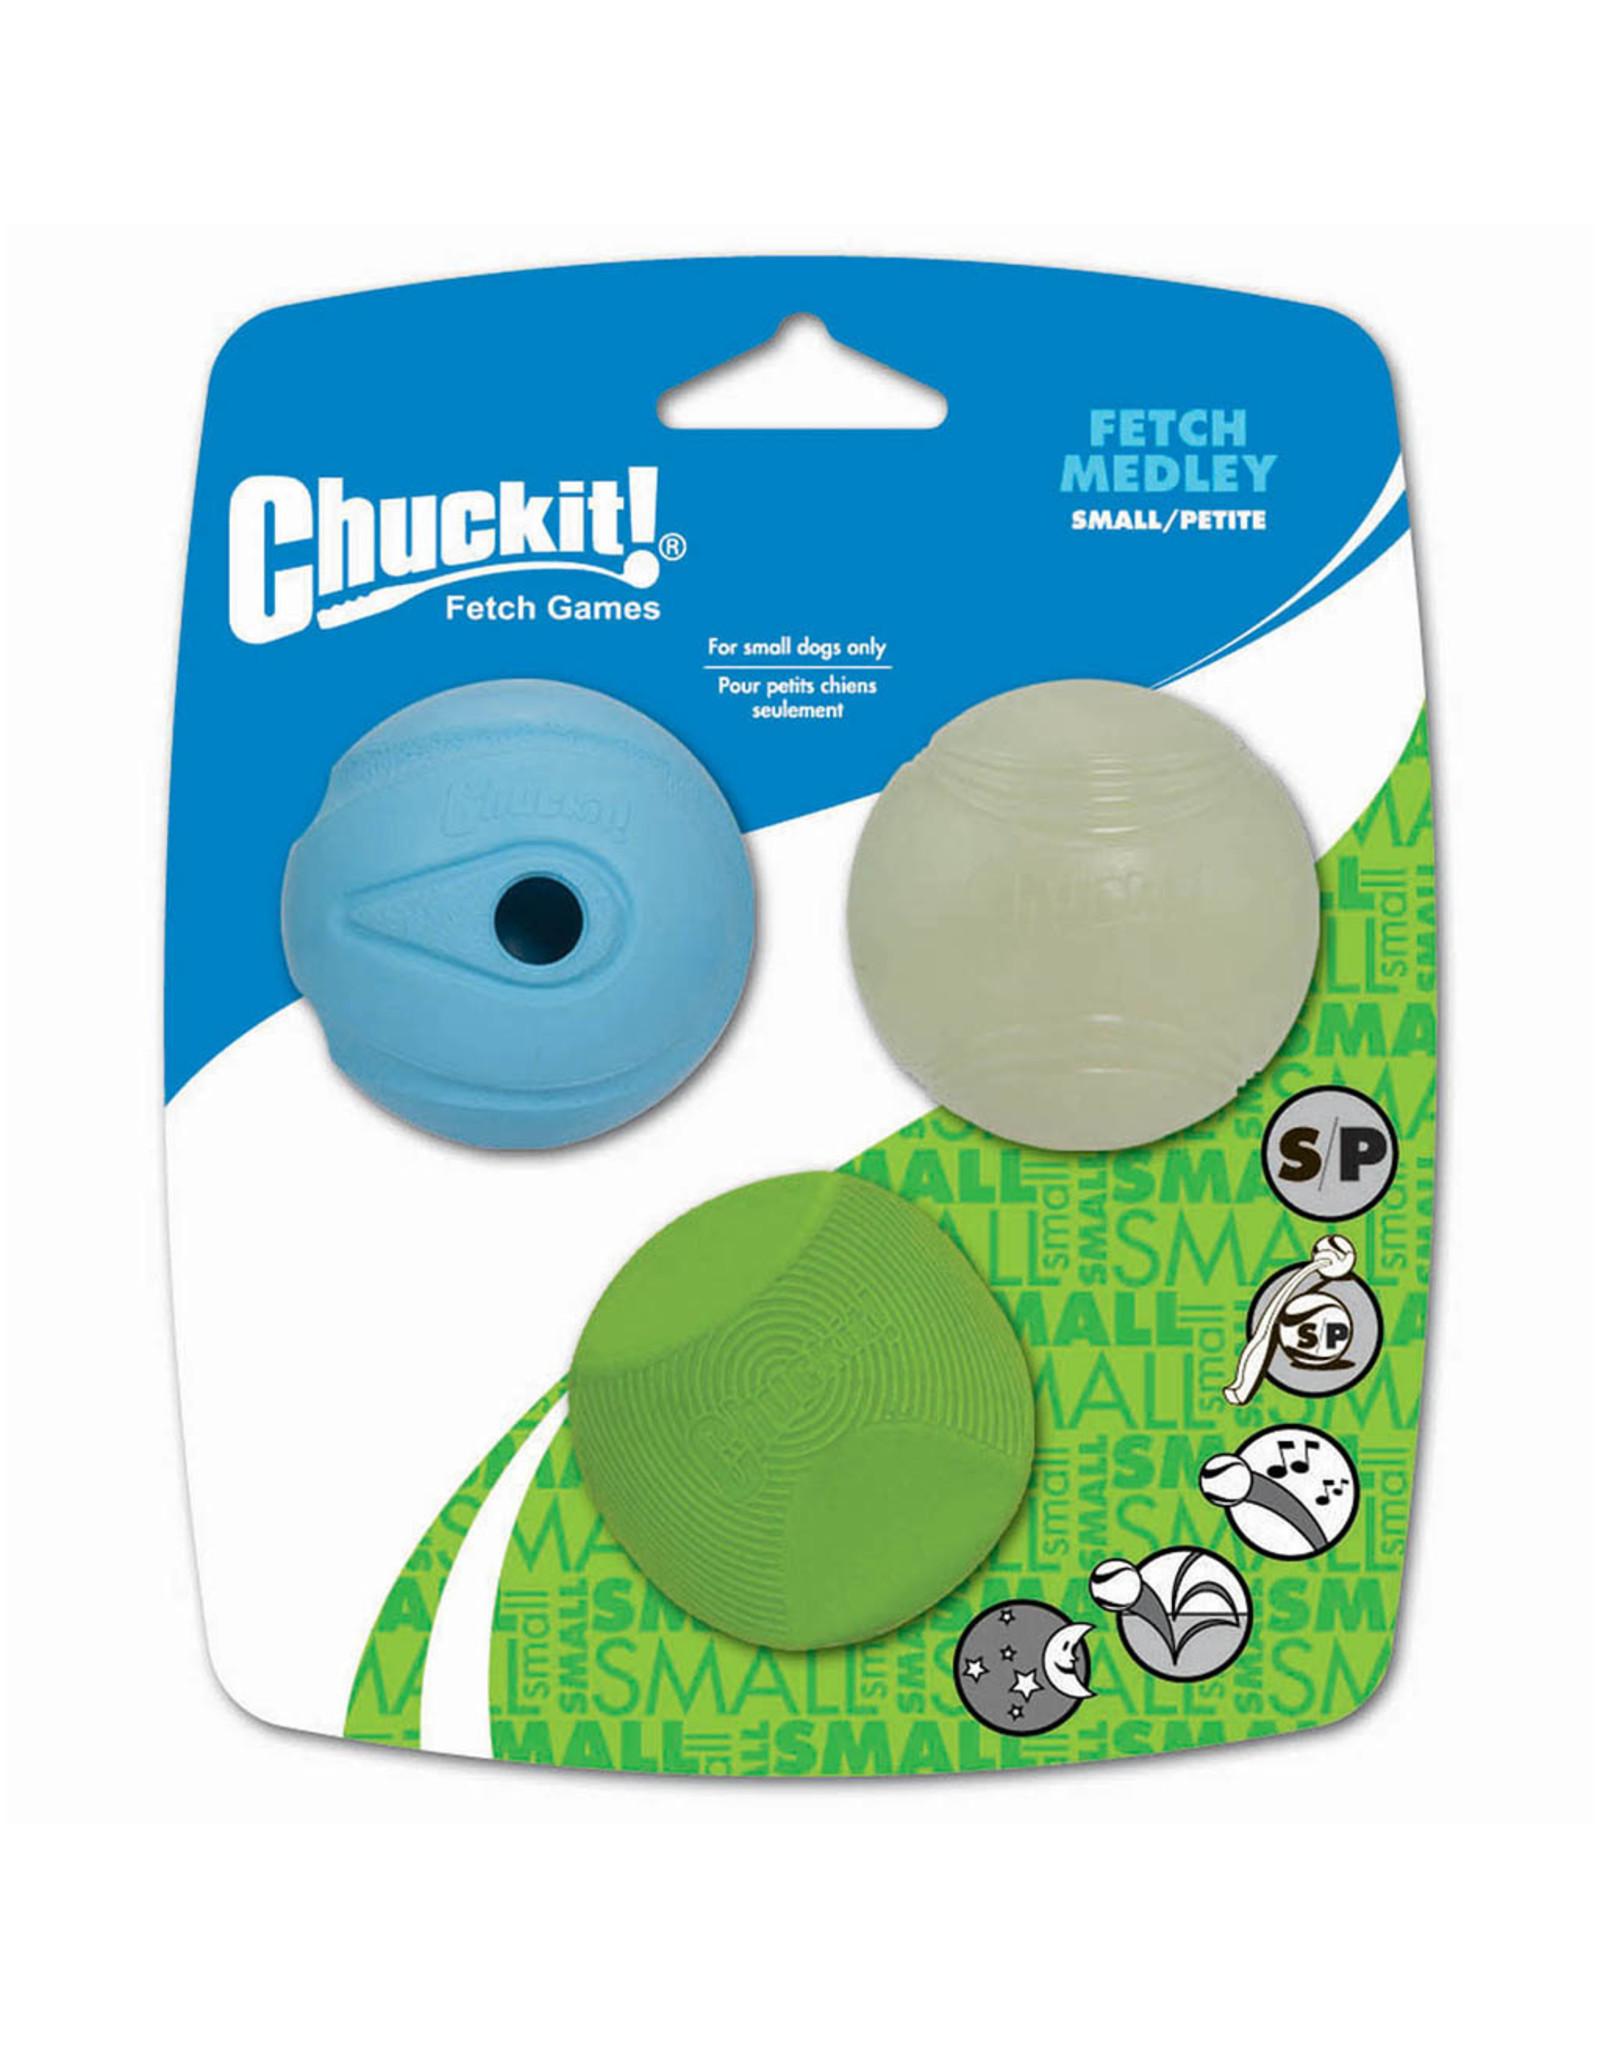 Chuckit! Chuckit! Fetch Medley 3PK